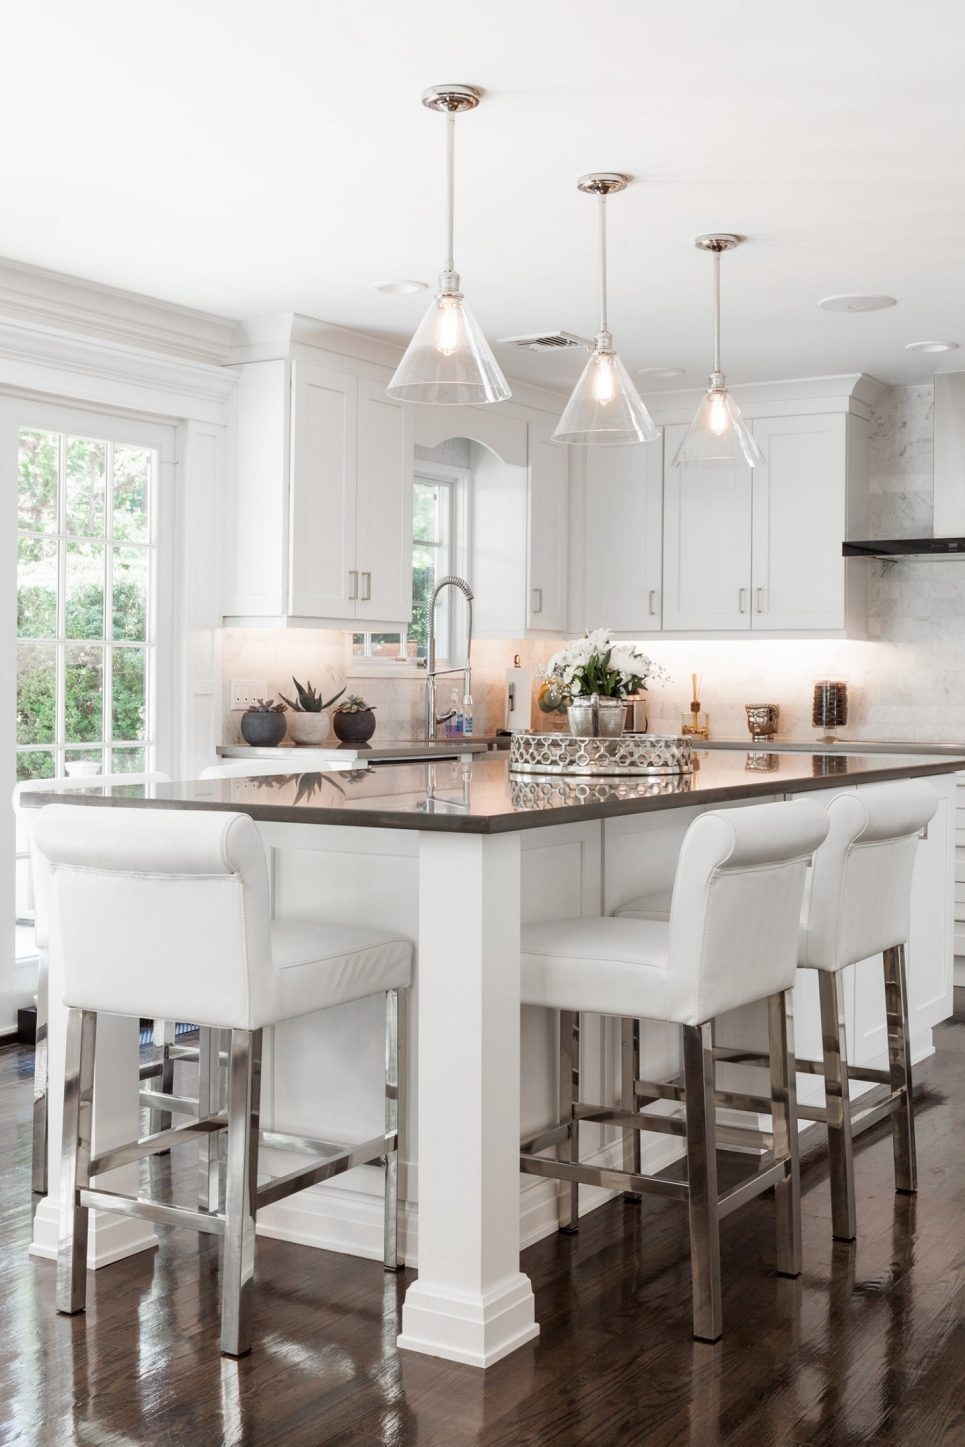 Kitchen Cabinet Remodeling Showroom In Gilbert Chandler Az Kitchen Island With Seating Kitchen Remodel Kitchen Design